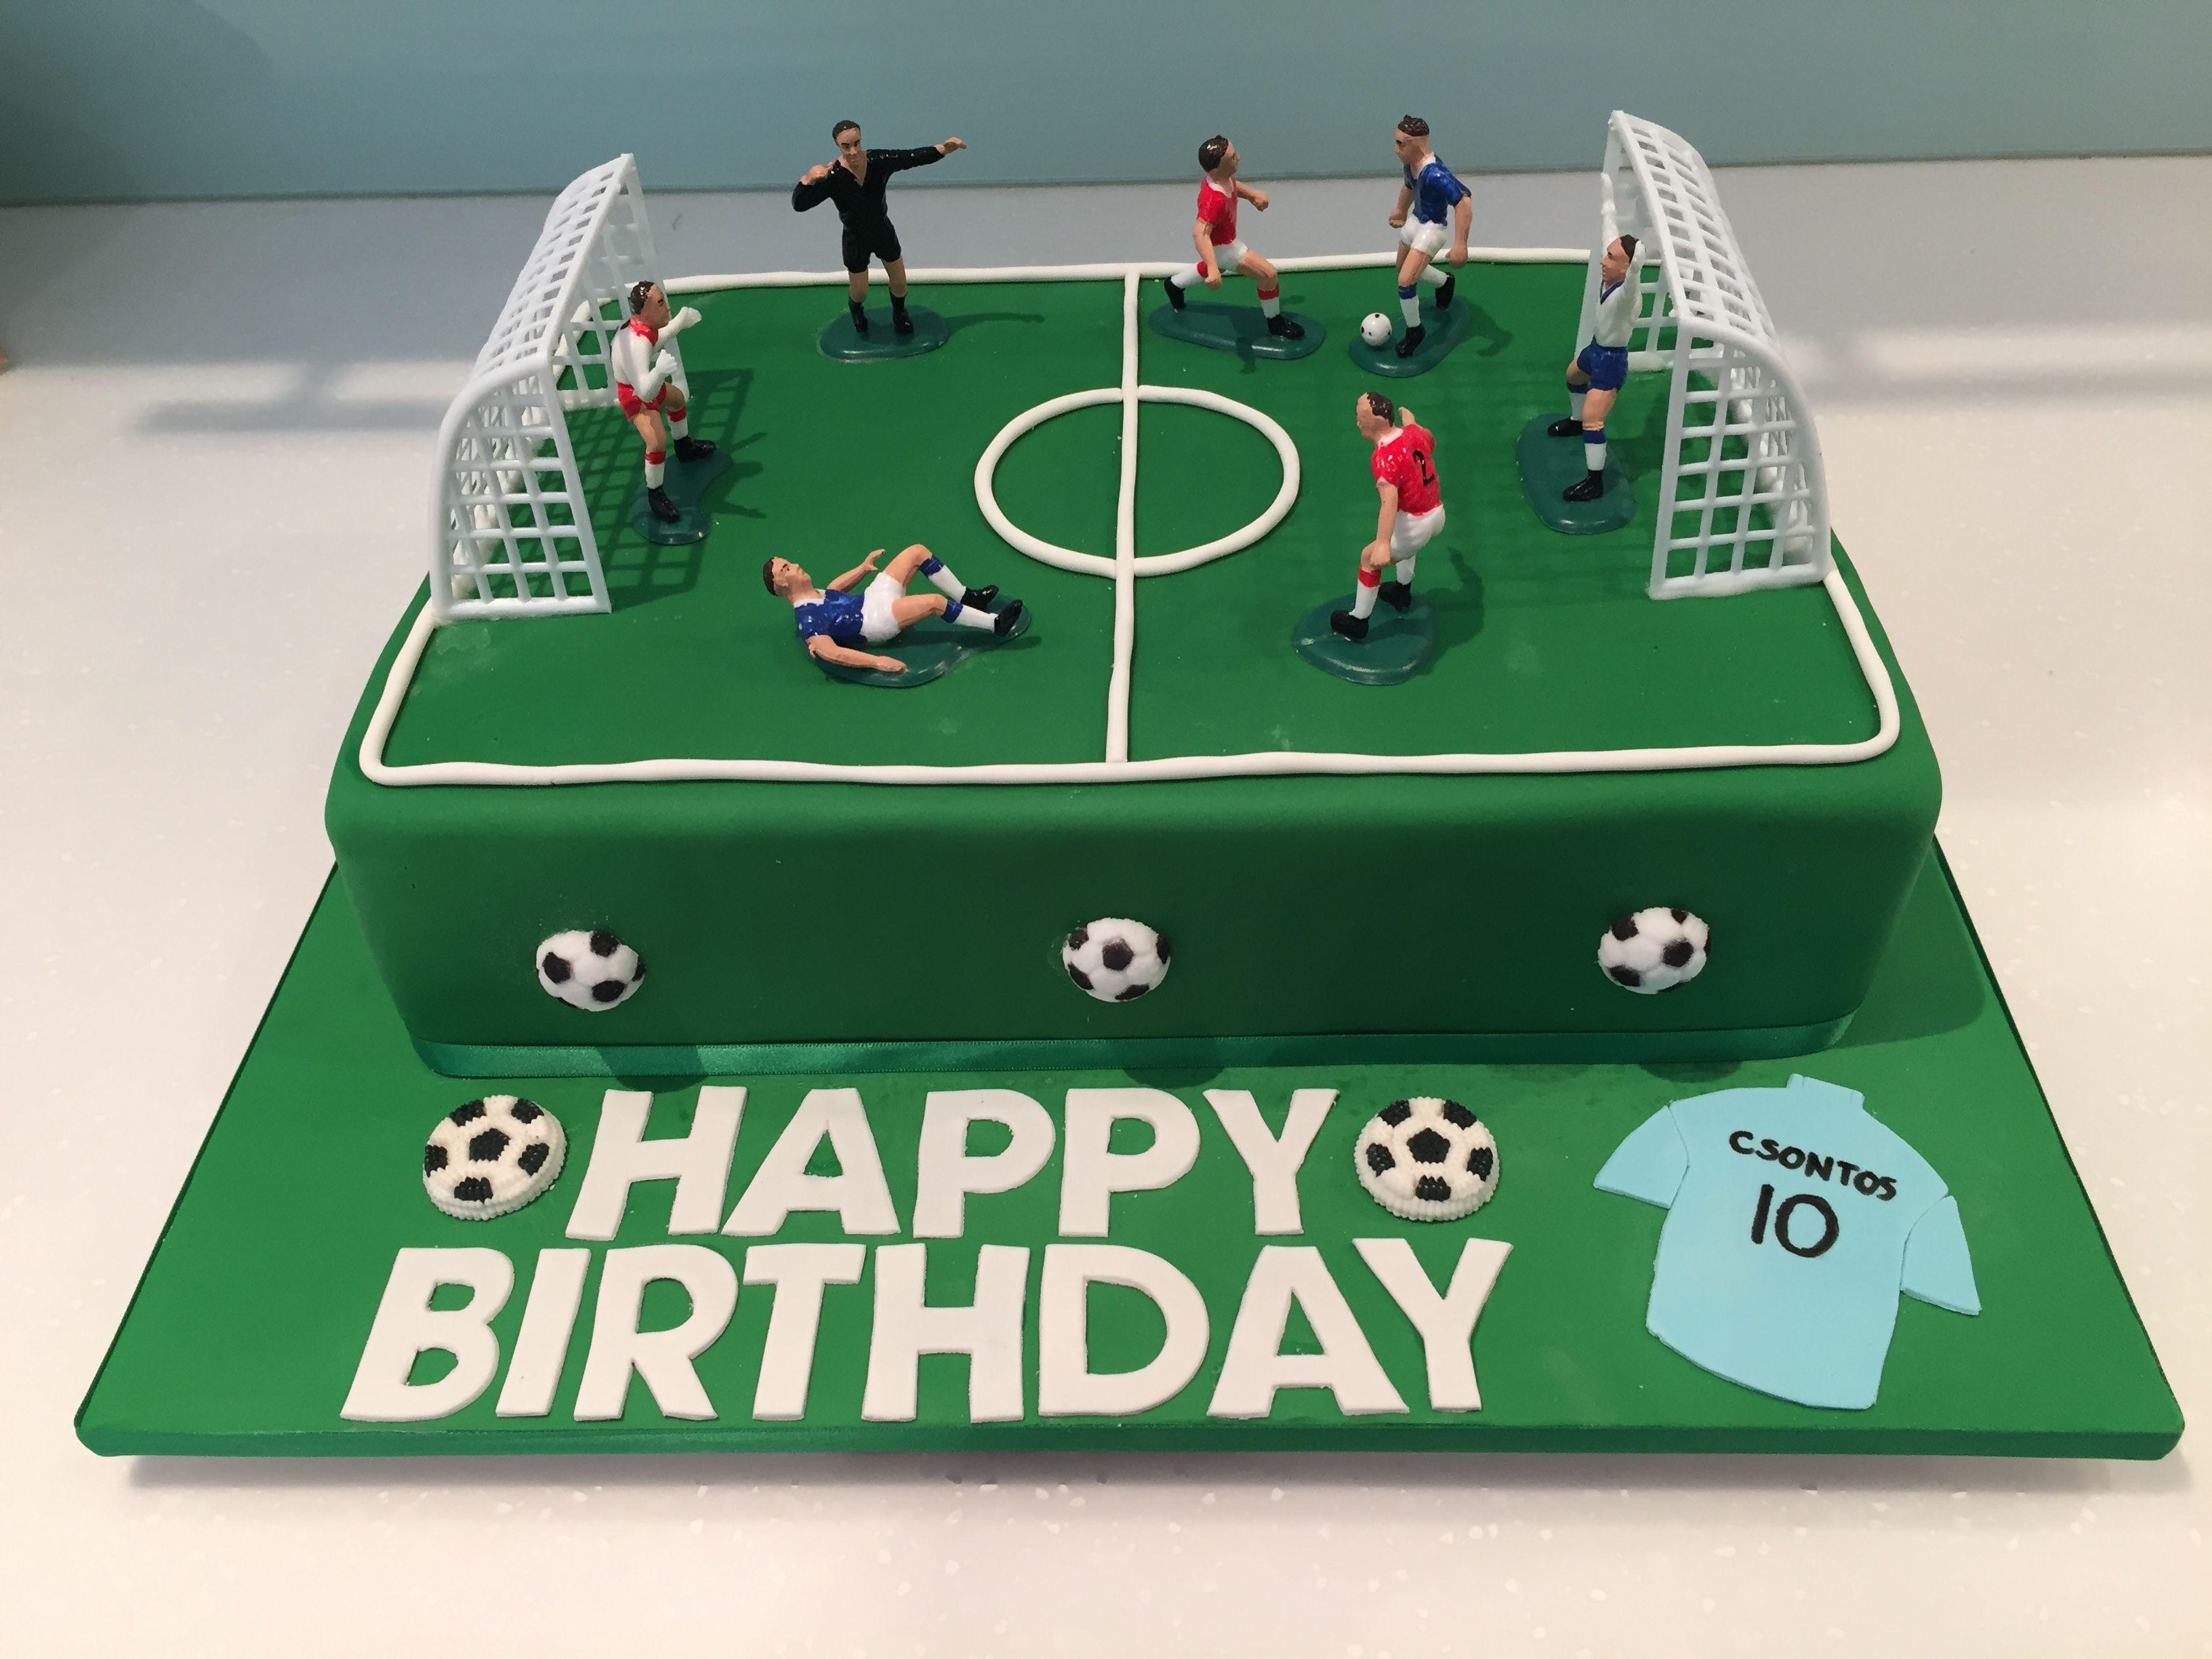 Pleasant Soccer Field Soccer Birthday Cakes Birthday Cakes For Men 40Th Funny Birthday Cards Online Aboleapandamsfinfo